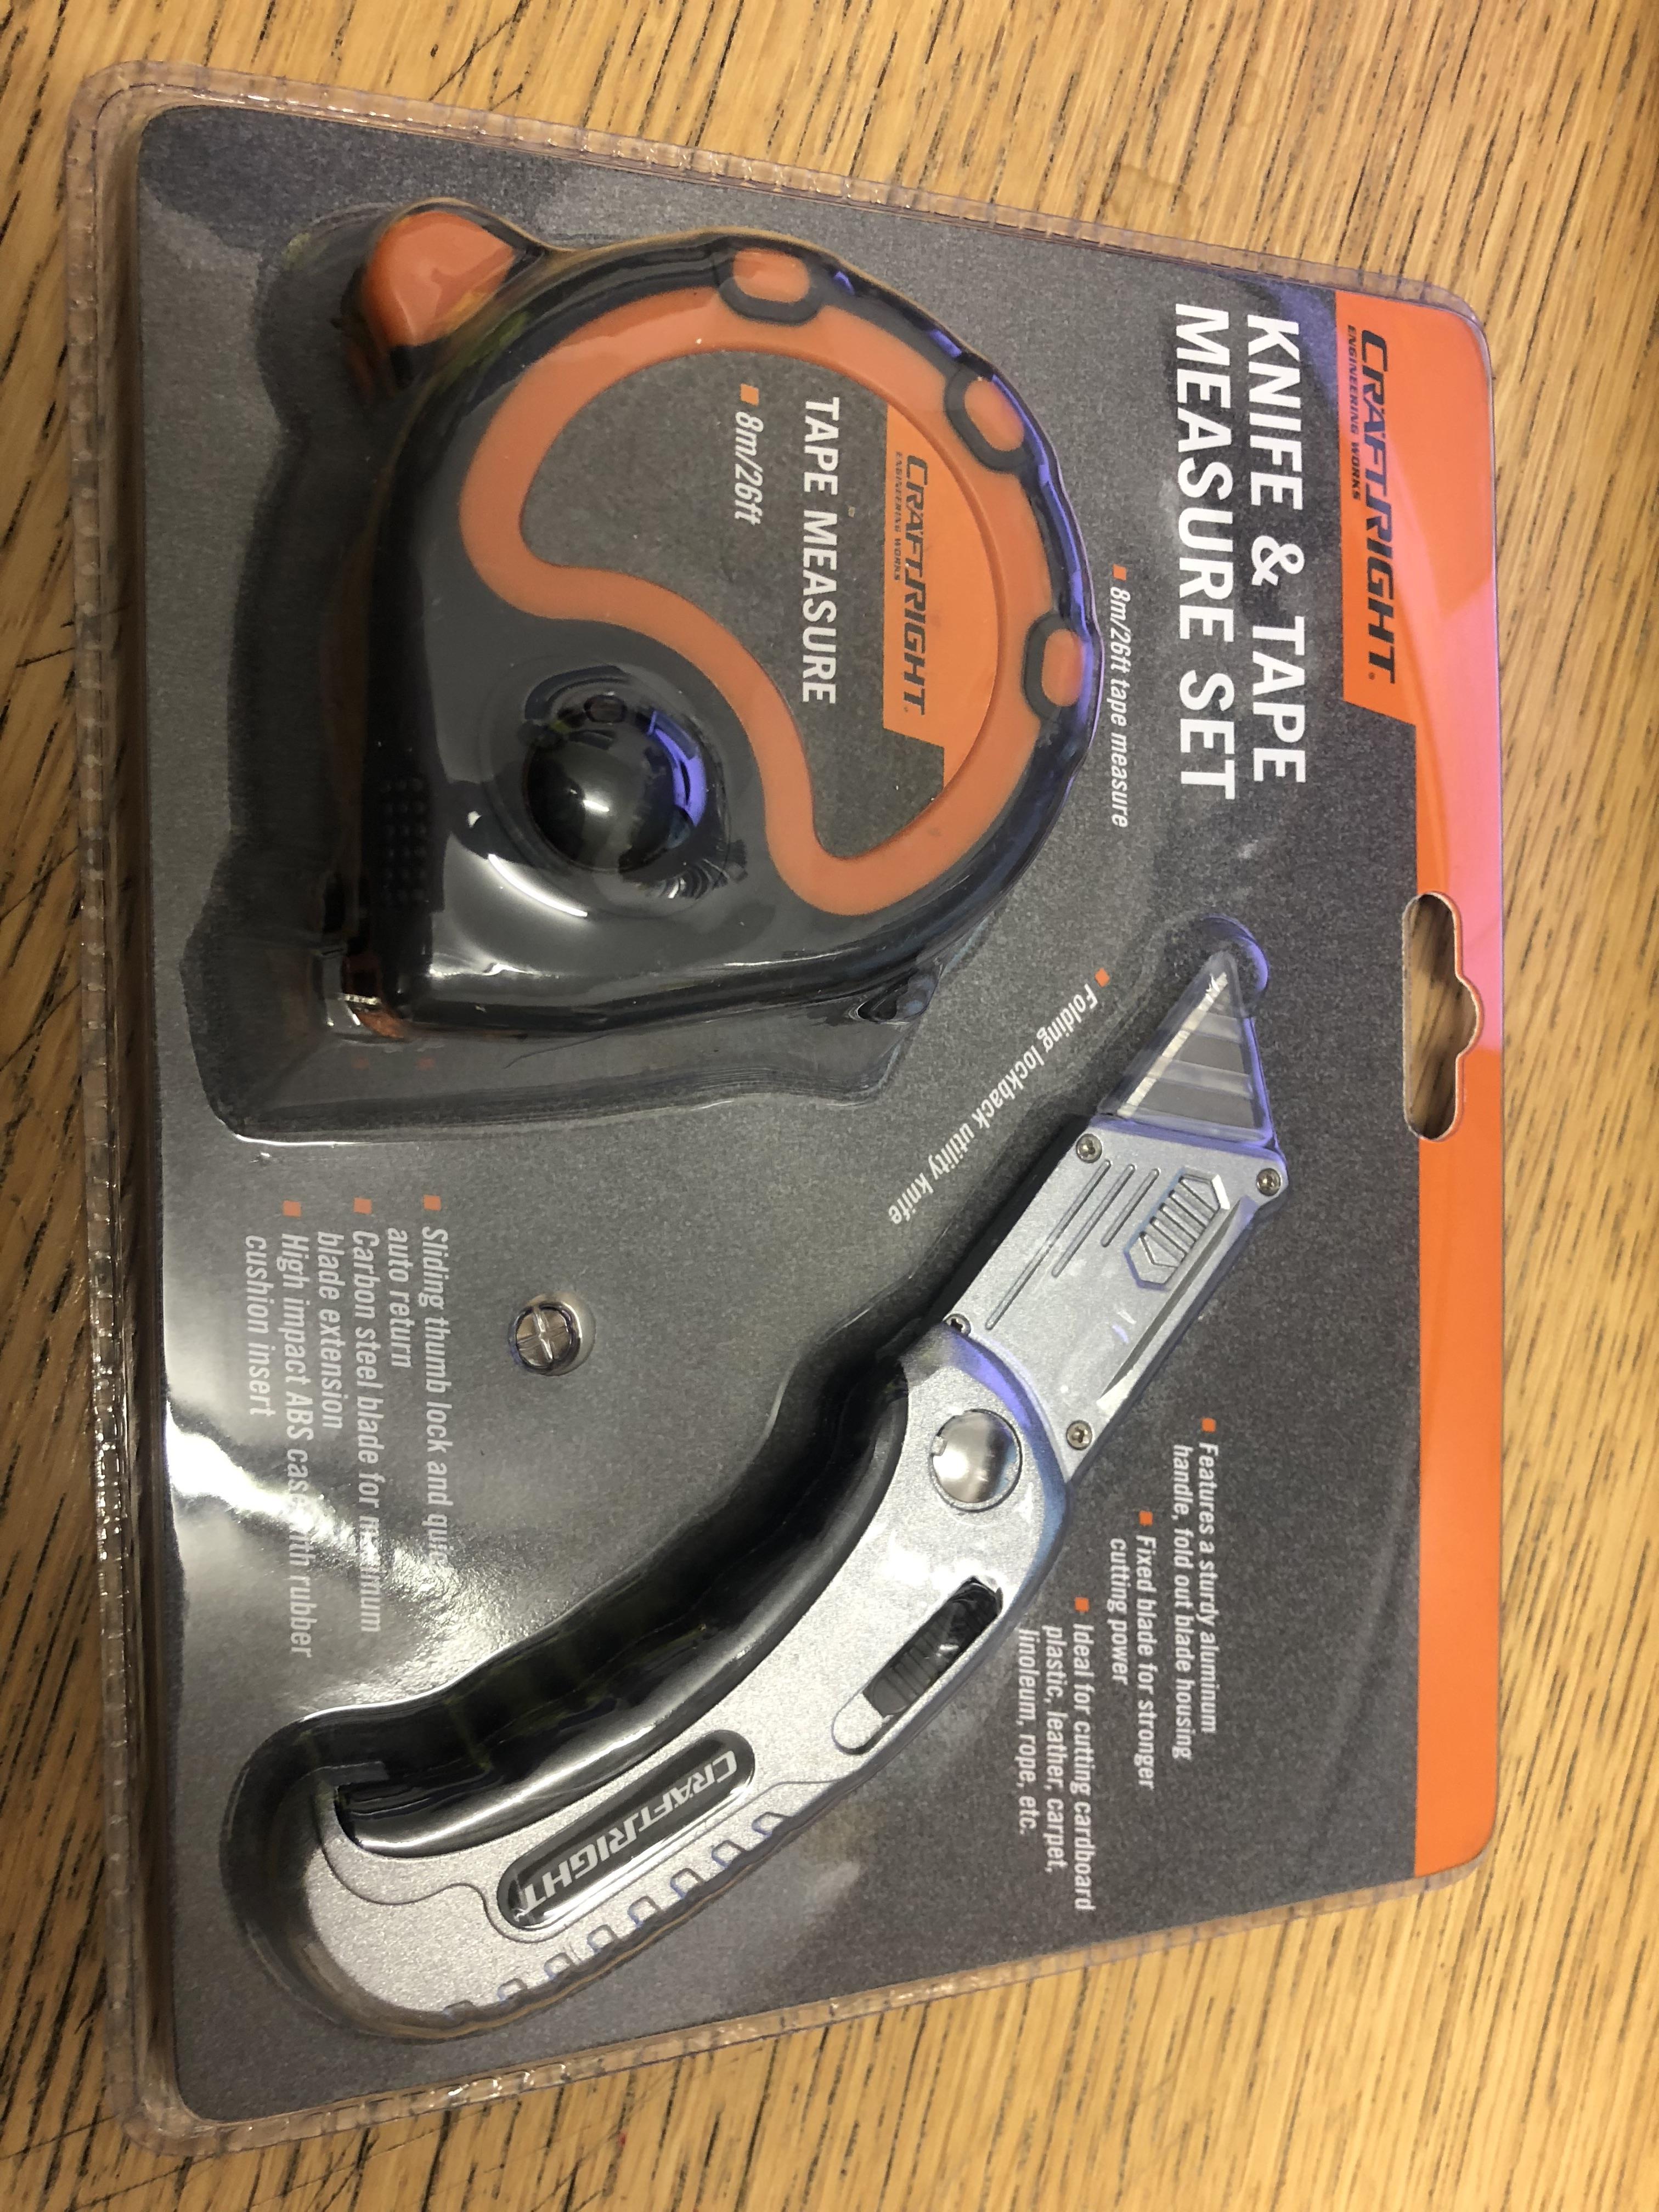 Lot 10217 - V Brand New Two Piece Knife And Tape Measure Set Inc 8m Tape Measure & Folding Lockback Utility